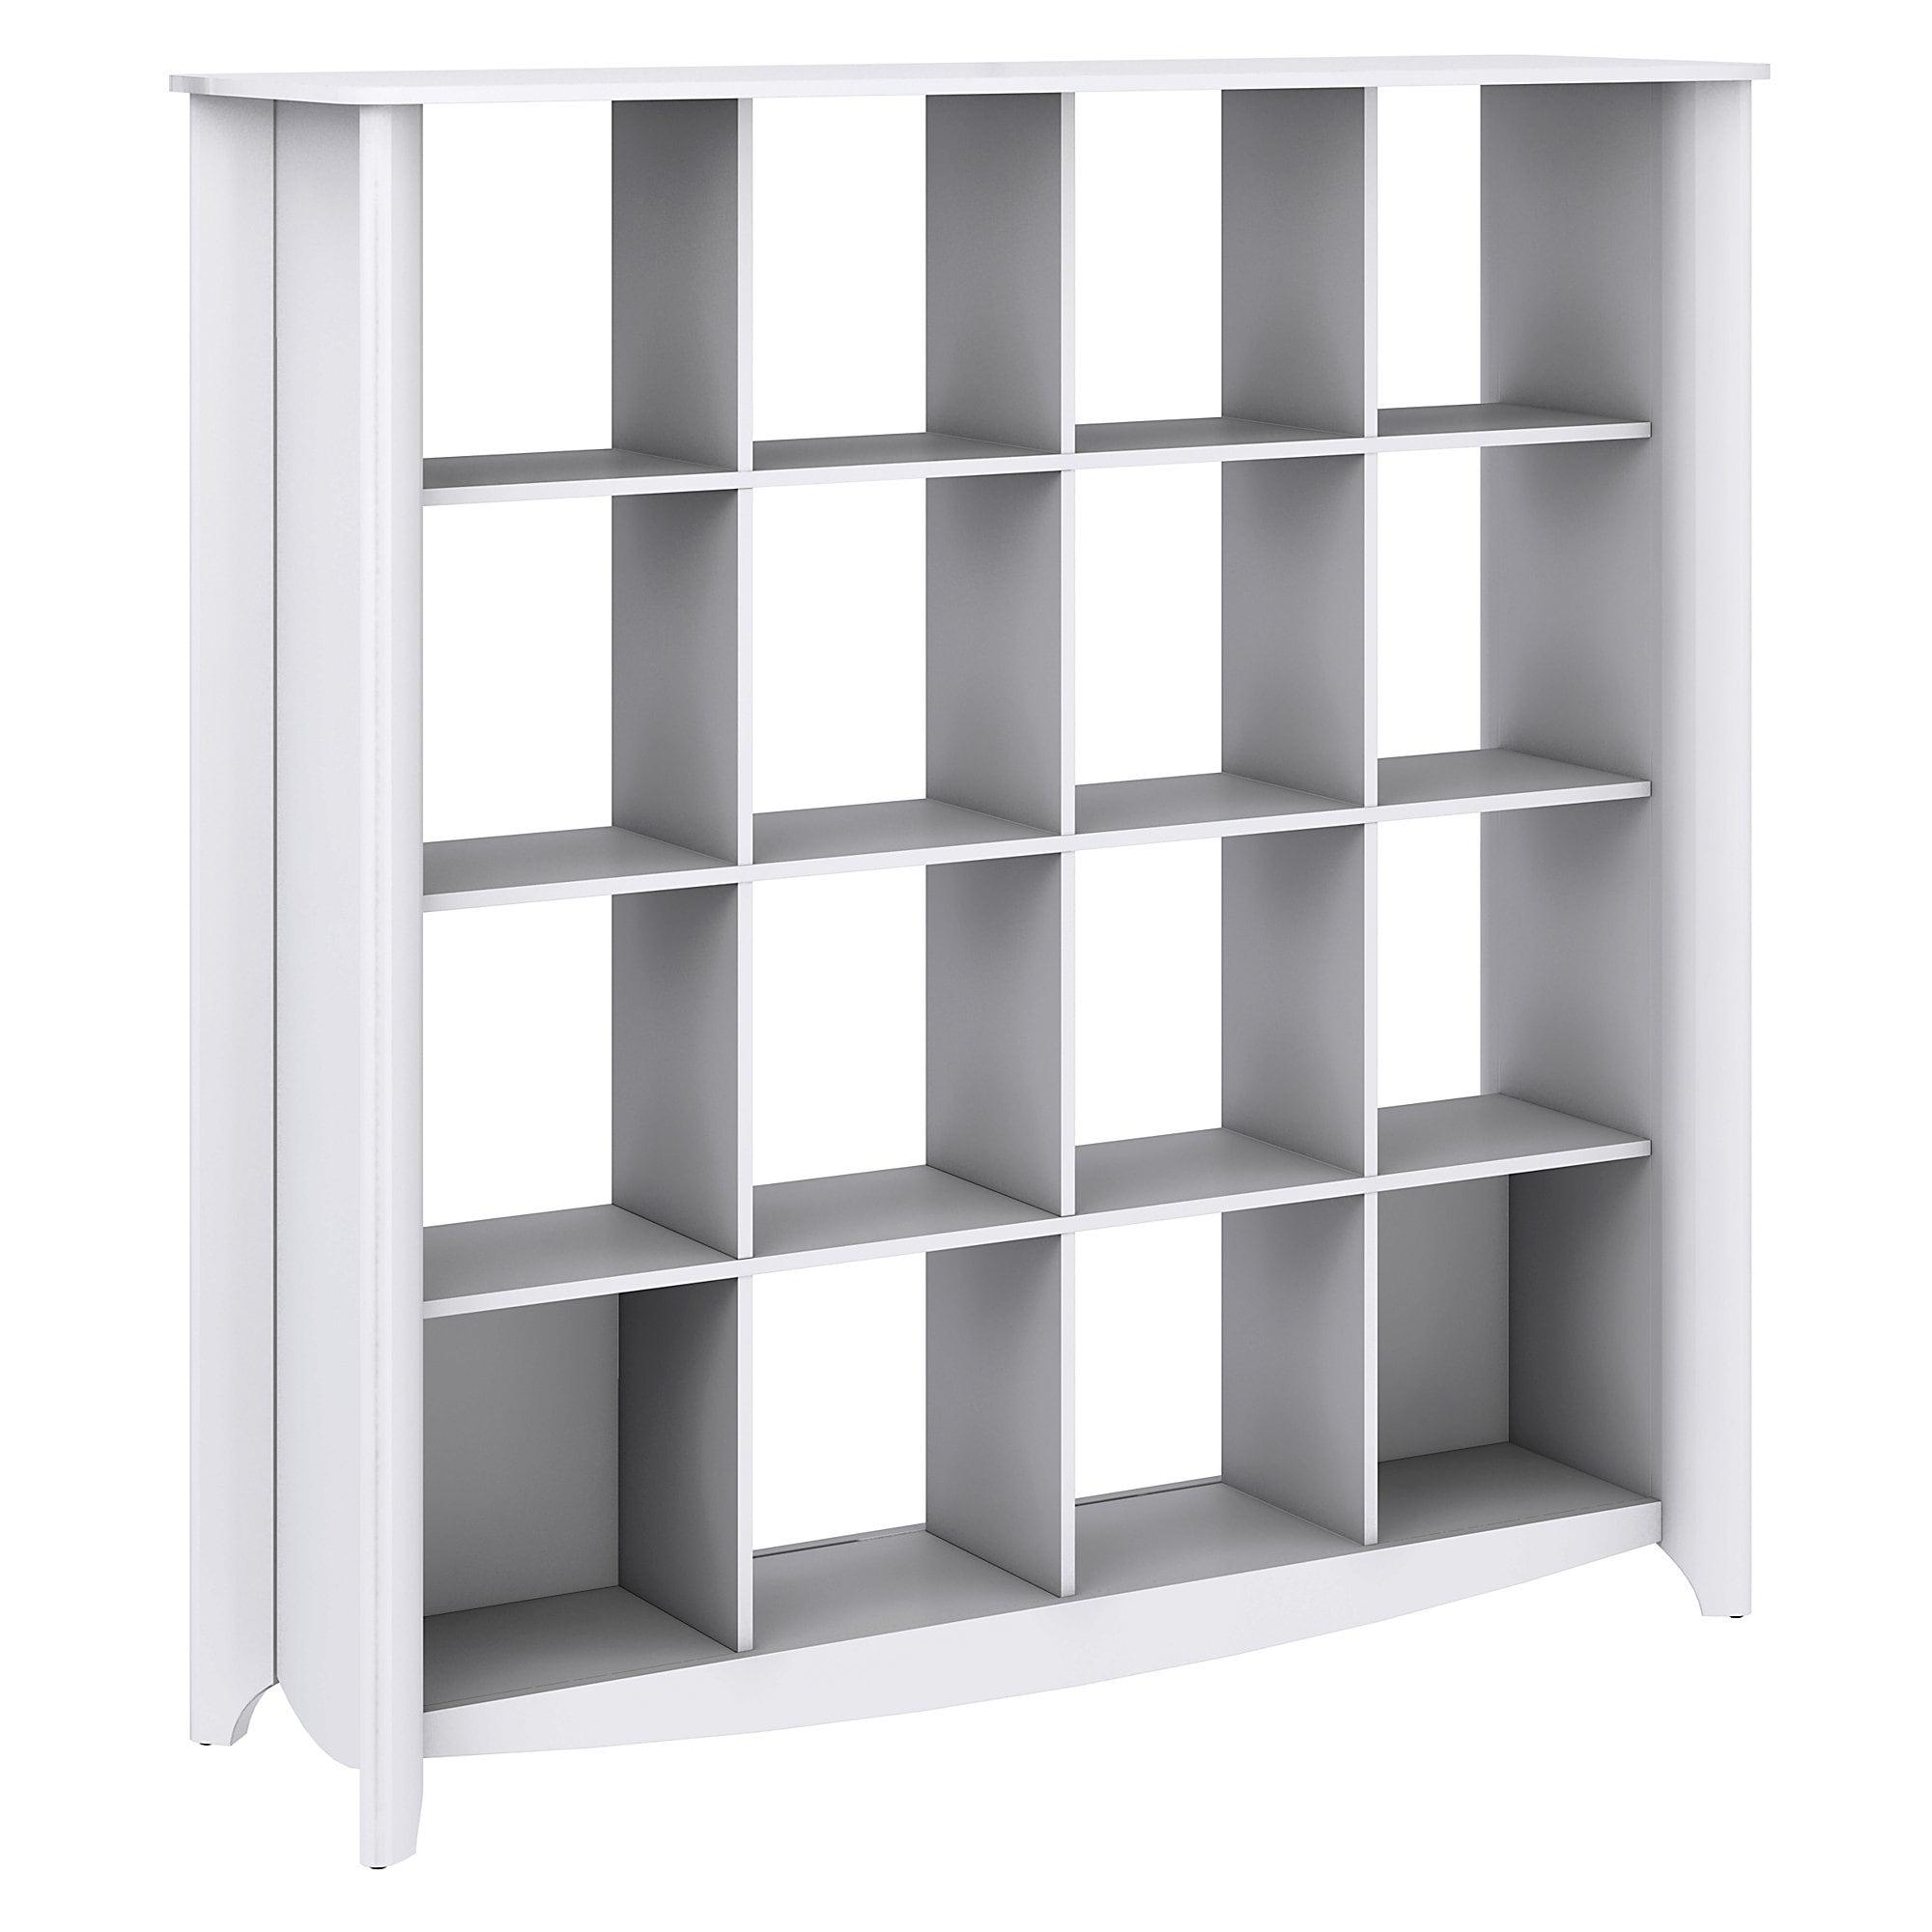 Bush Furniture Aero 16 Cube Bookcase/Room Divider - Free Shipping Today -  Overstock.com - 15565471